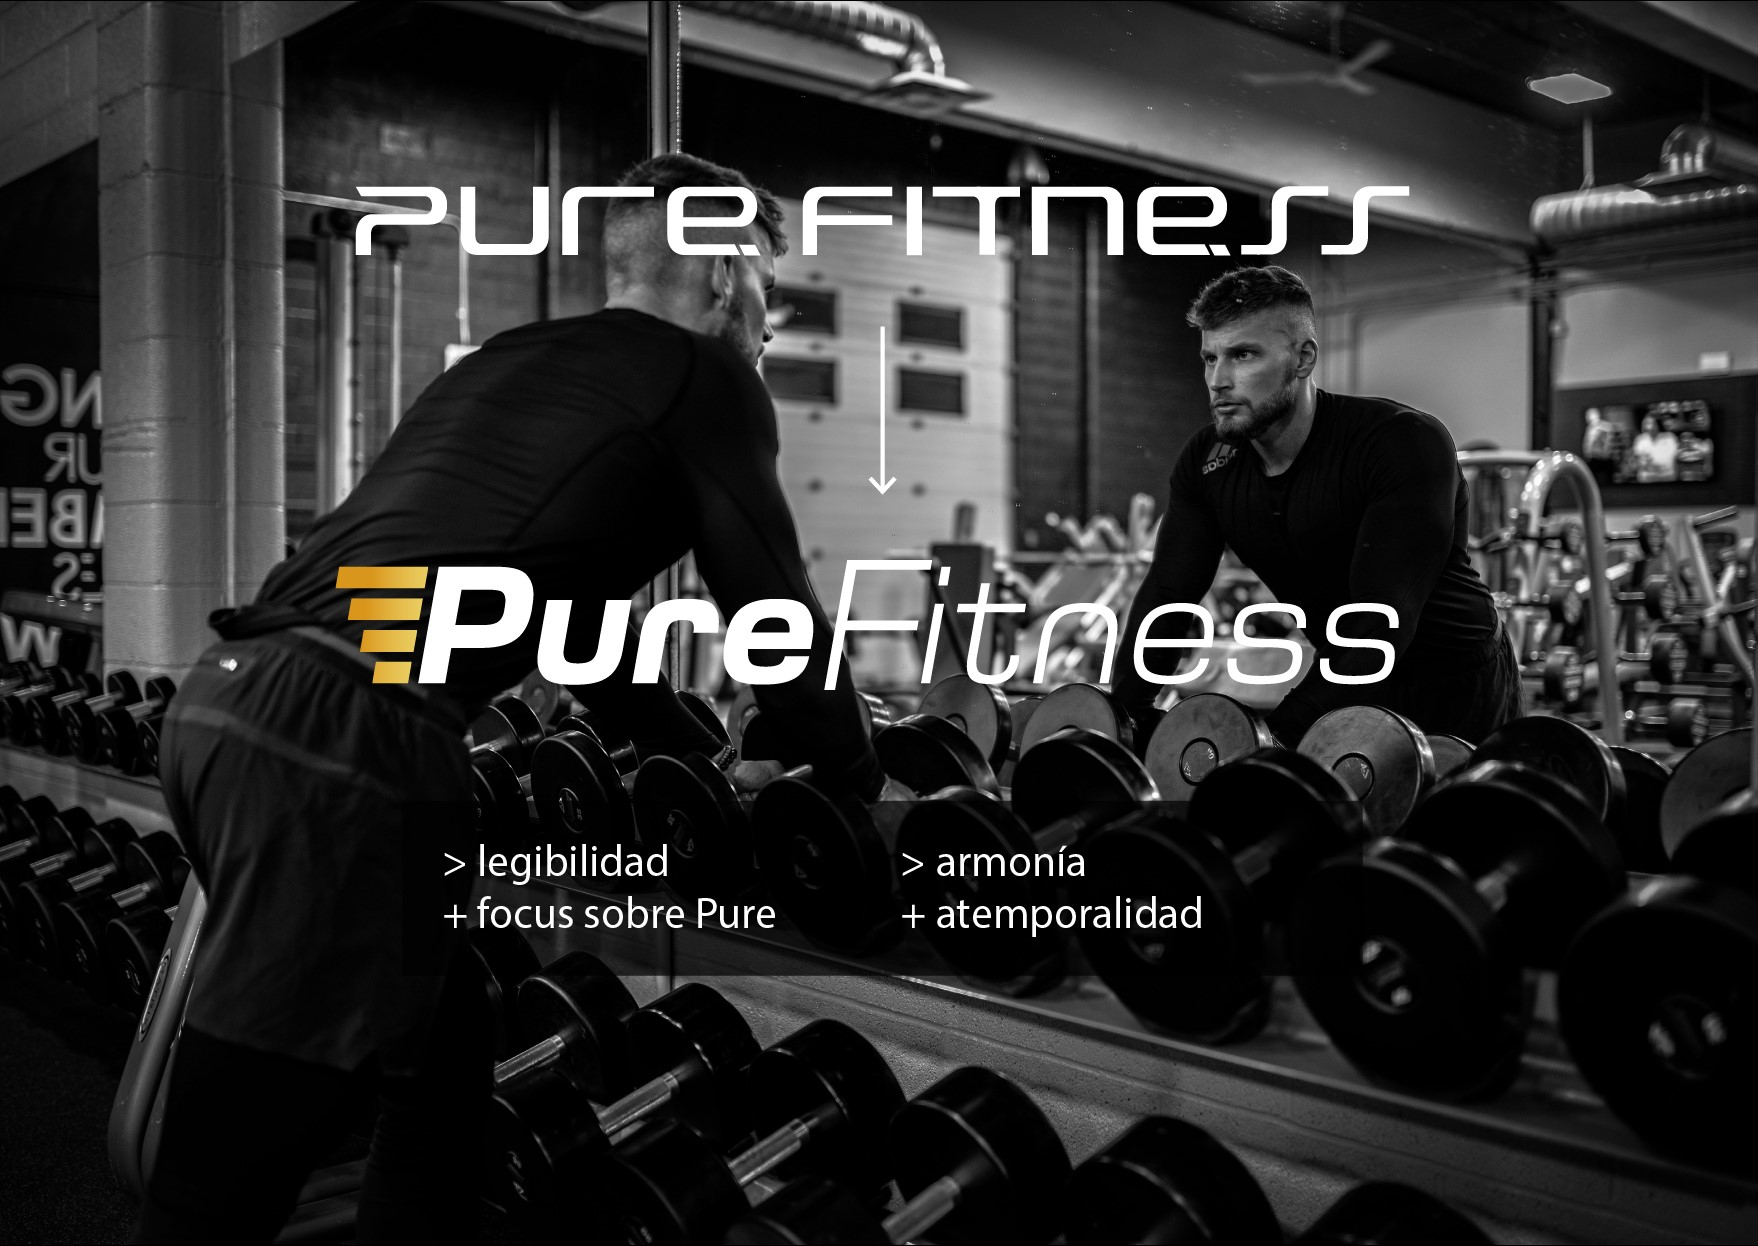 Pure Fitness renueva su imagen